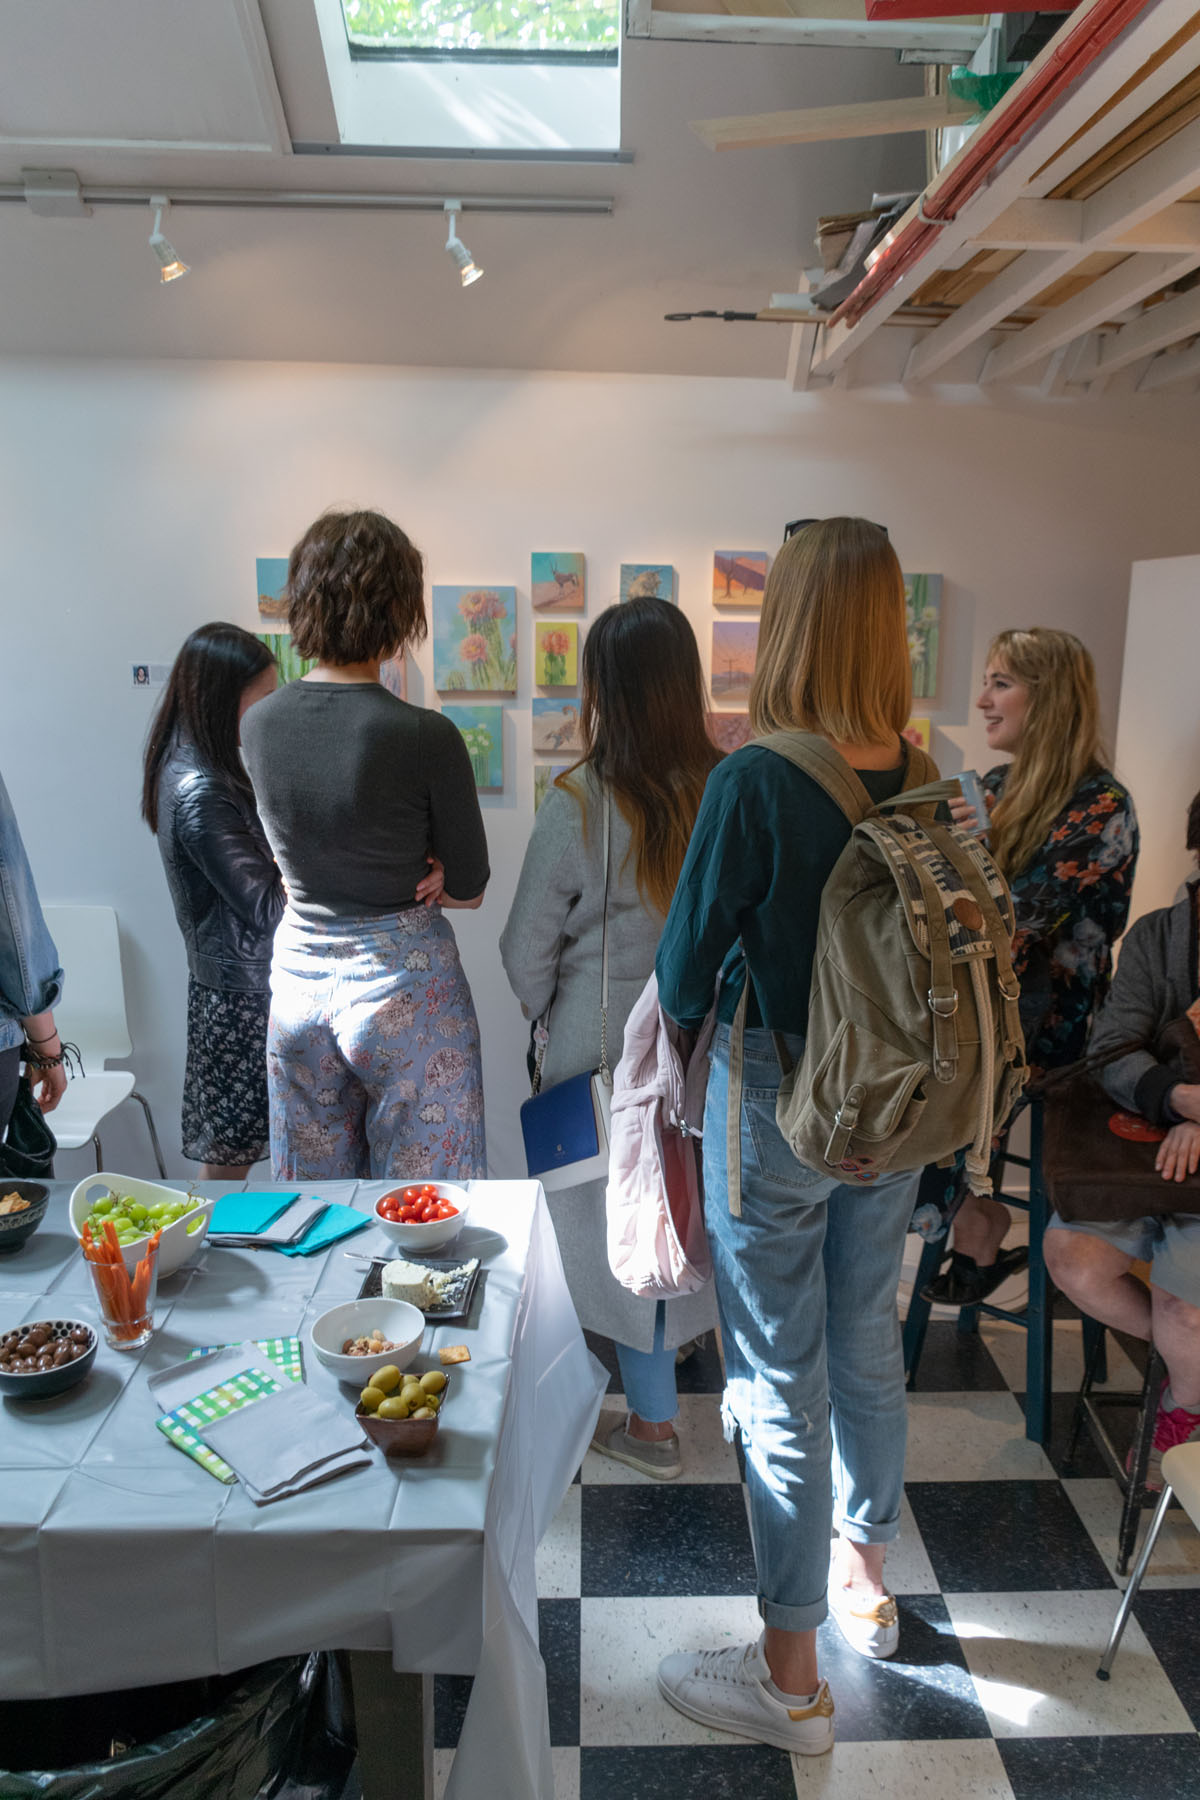 Visitors admiring Jominca's work during the show